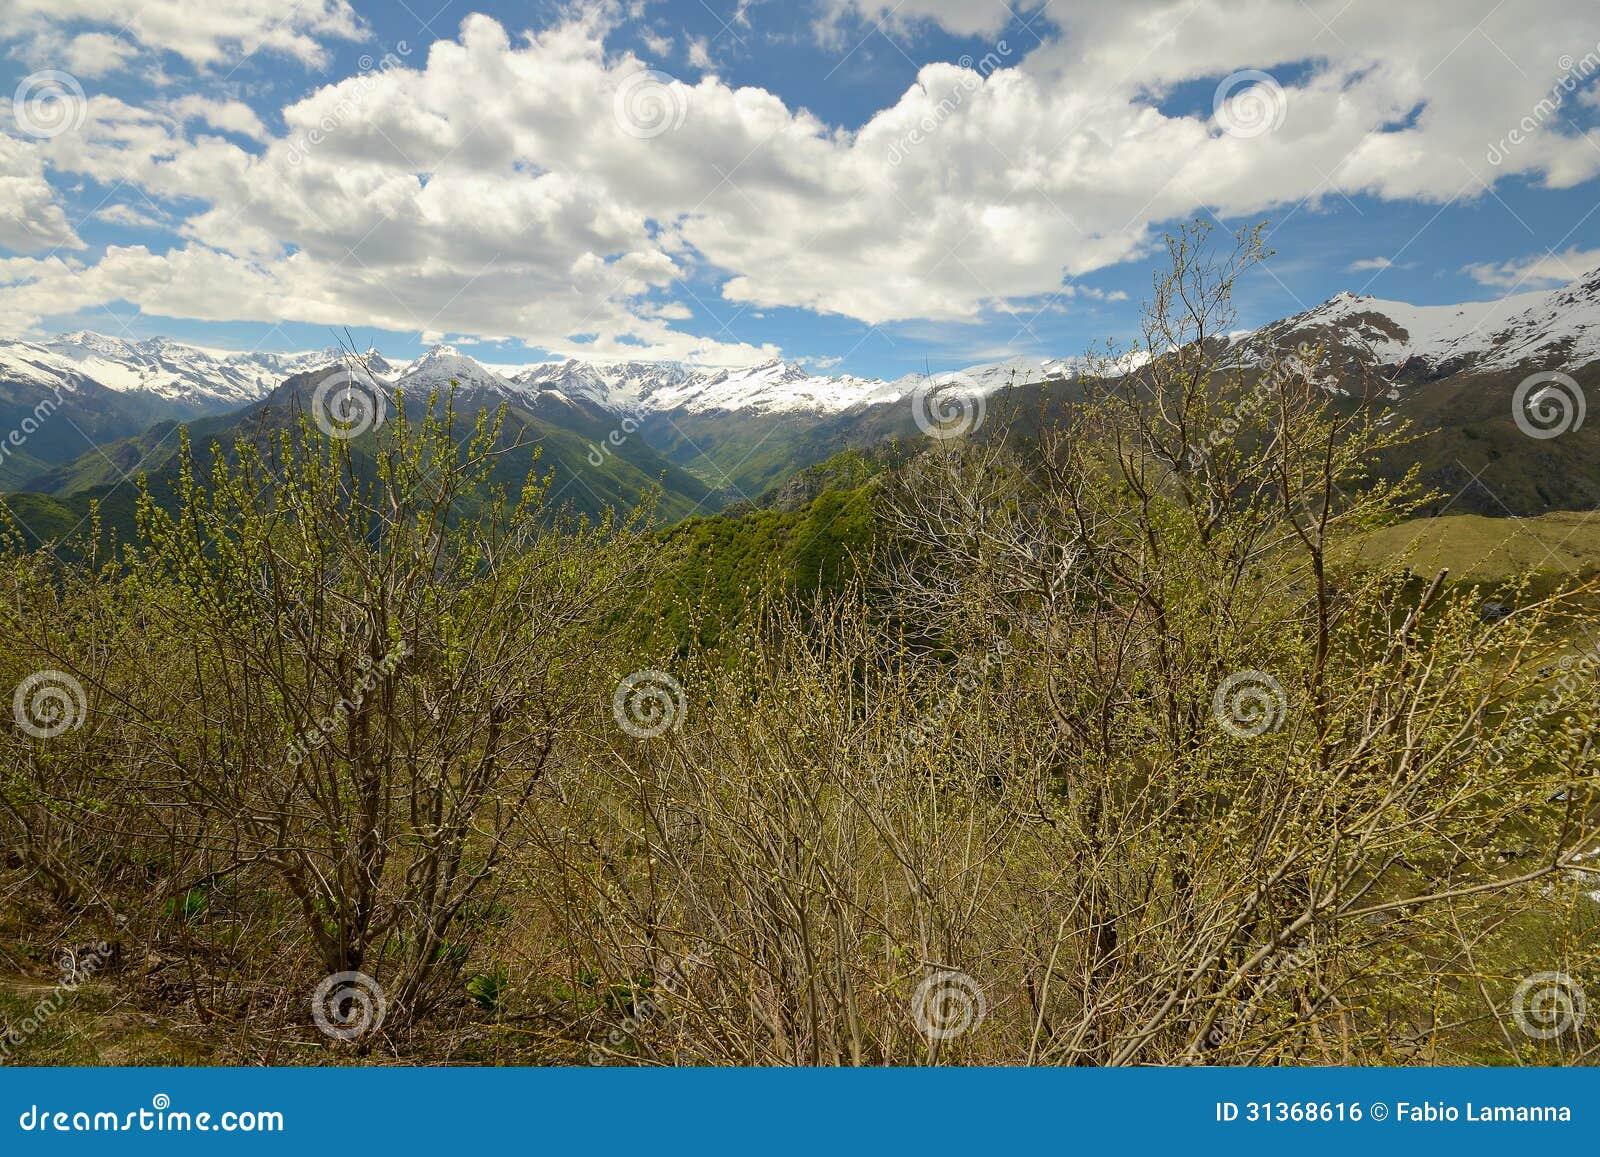 Snowcapped Imágenes De Stock Snowcapped Fotos De Stock: Snowcapped Alpine Arc In Spring Royalty Free Stock Image